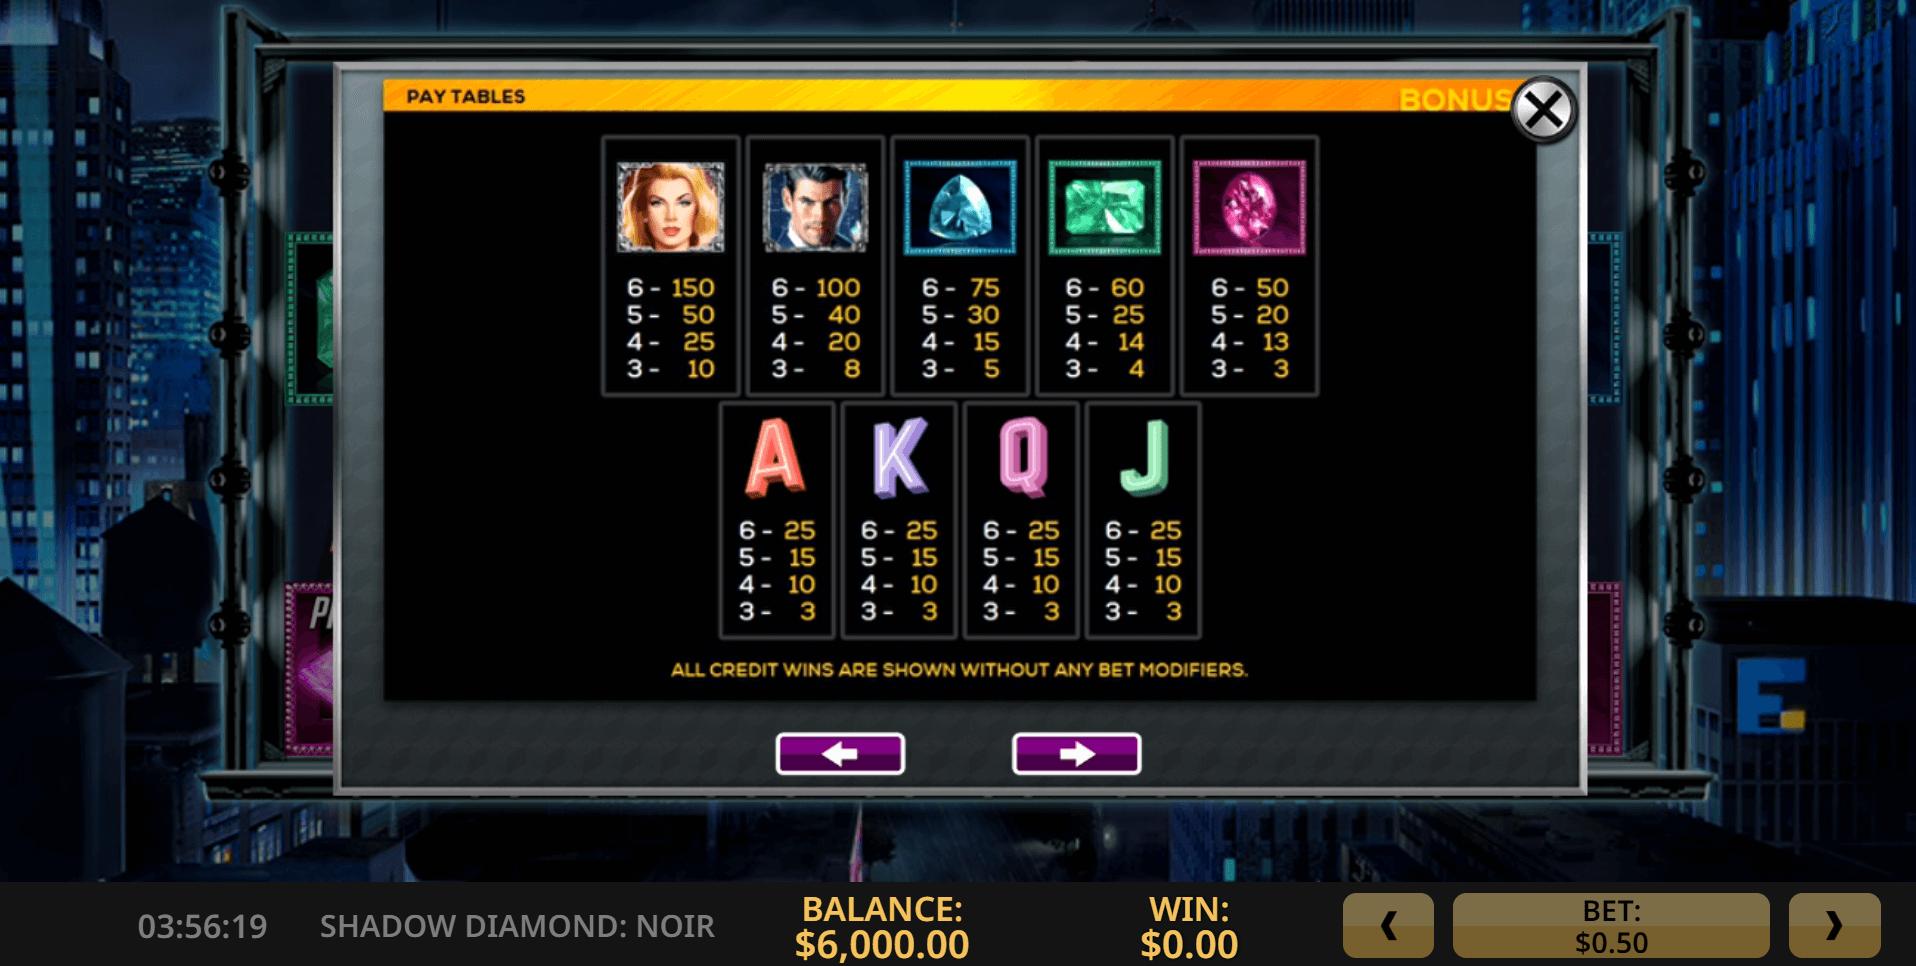 Shadow Diamond Noir Slot Machine